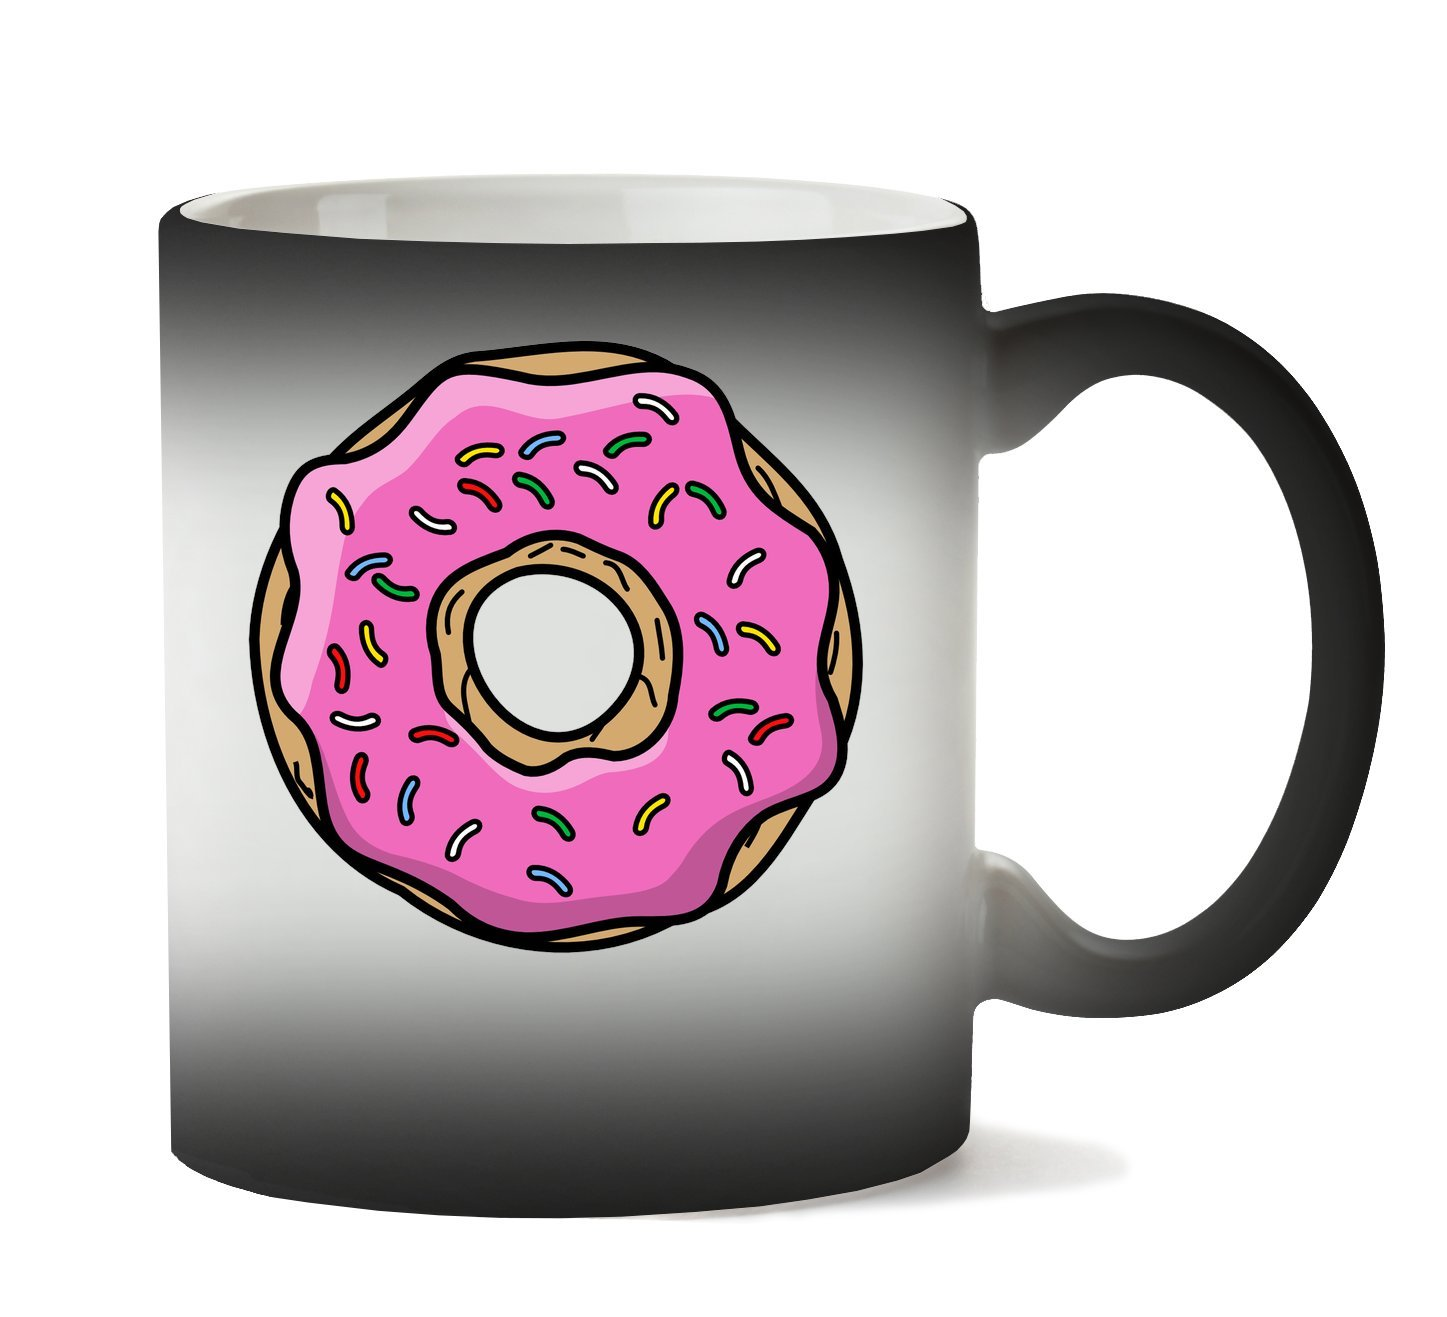 Taza con donut Cambio De Color con calorhttps://amzn.to/2BE93jL